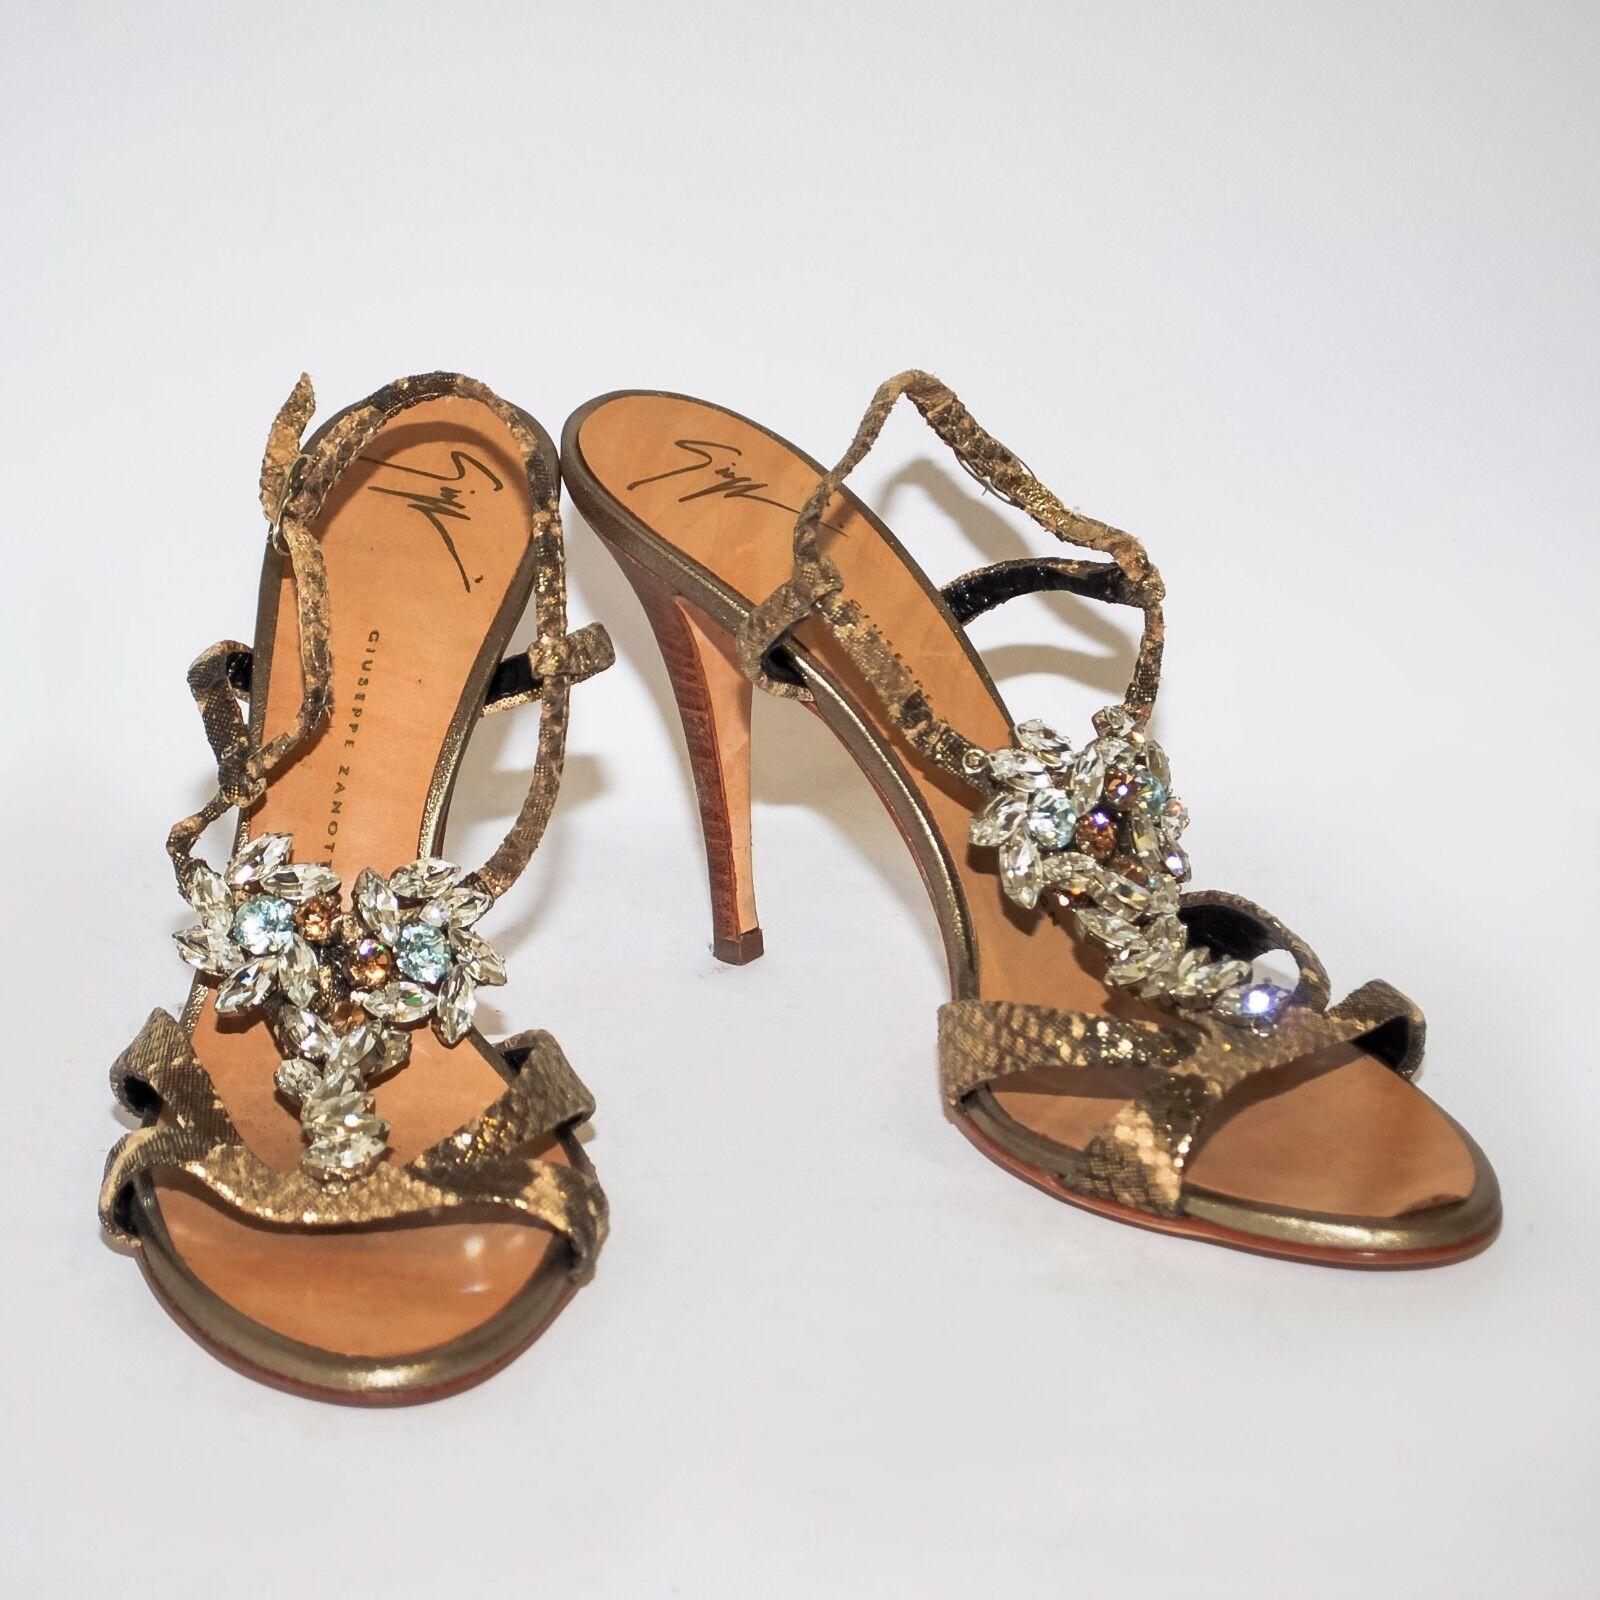 punto vendita Giuseppe Zanotti oro Leather Leather Leather High Heels Sandals Crystal Pumps Stilettos US 7.5  fabbrica diretta